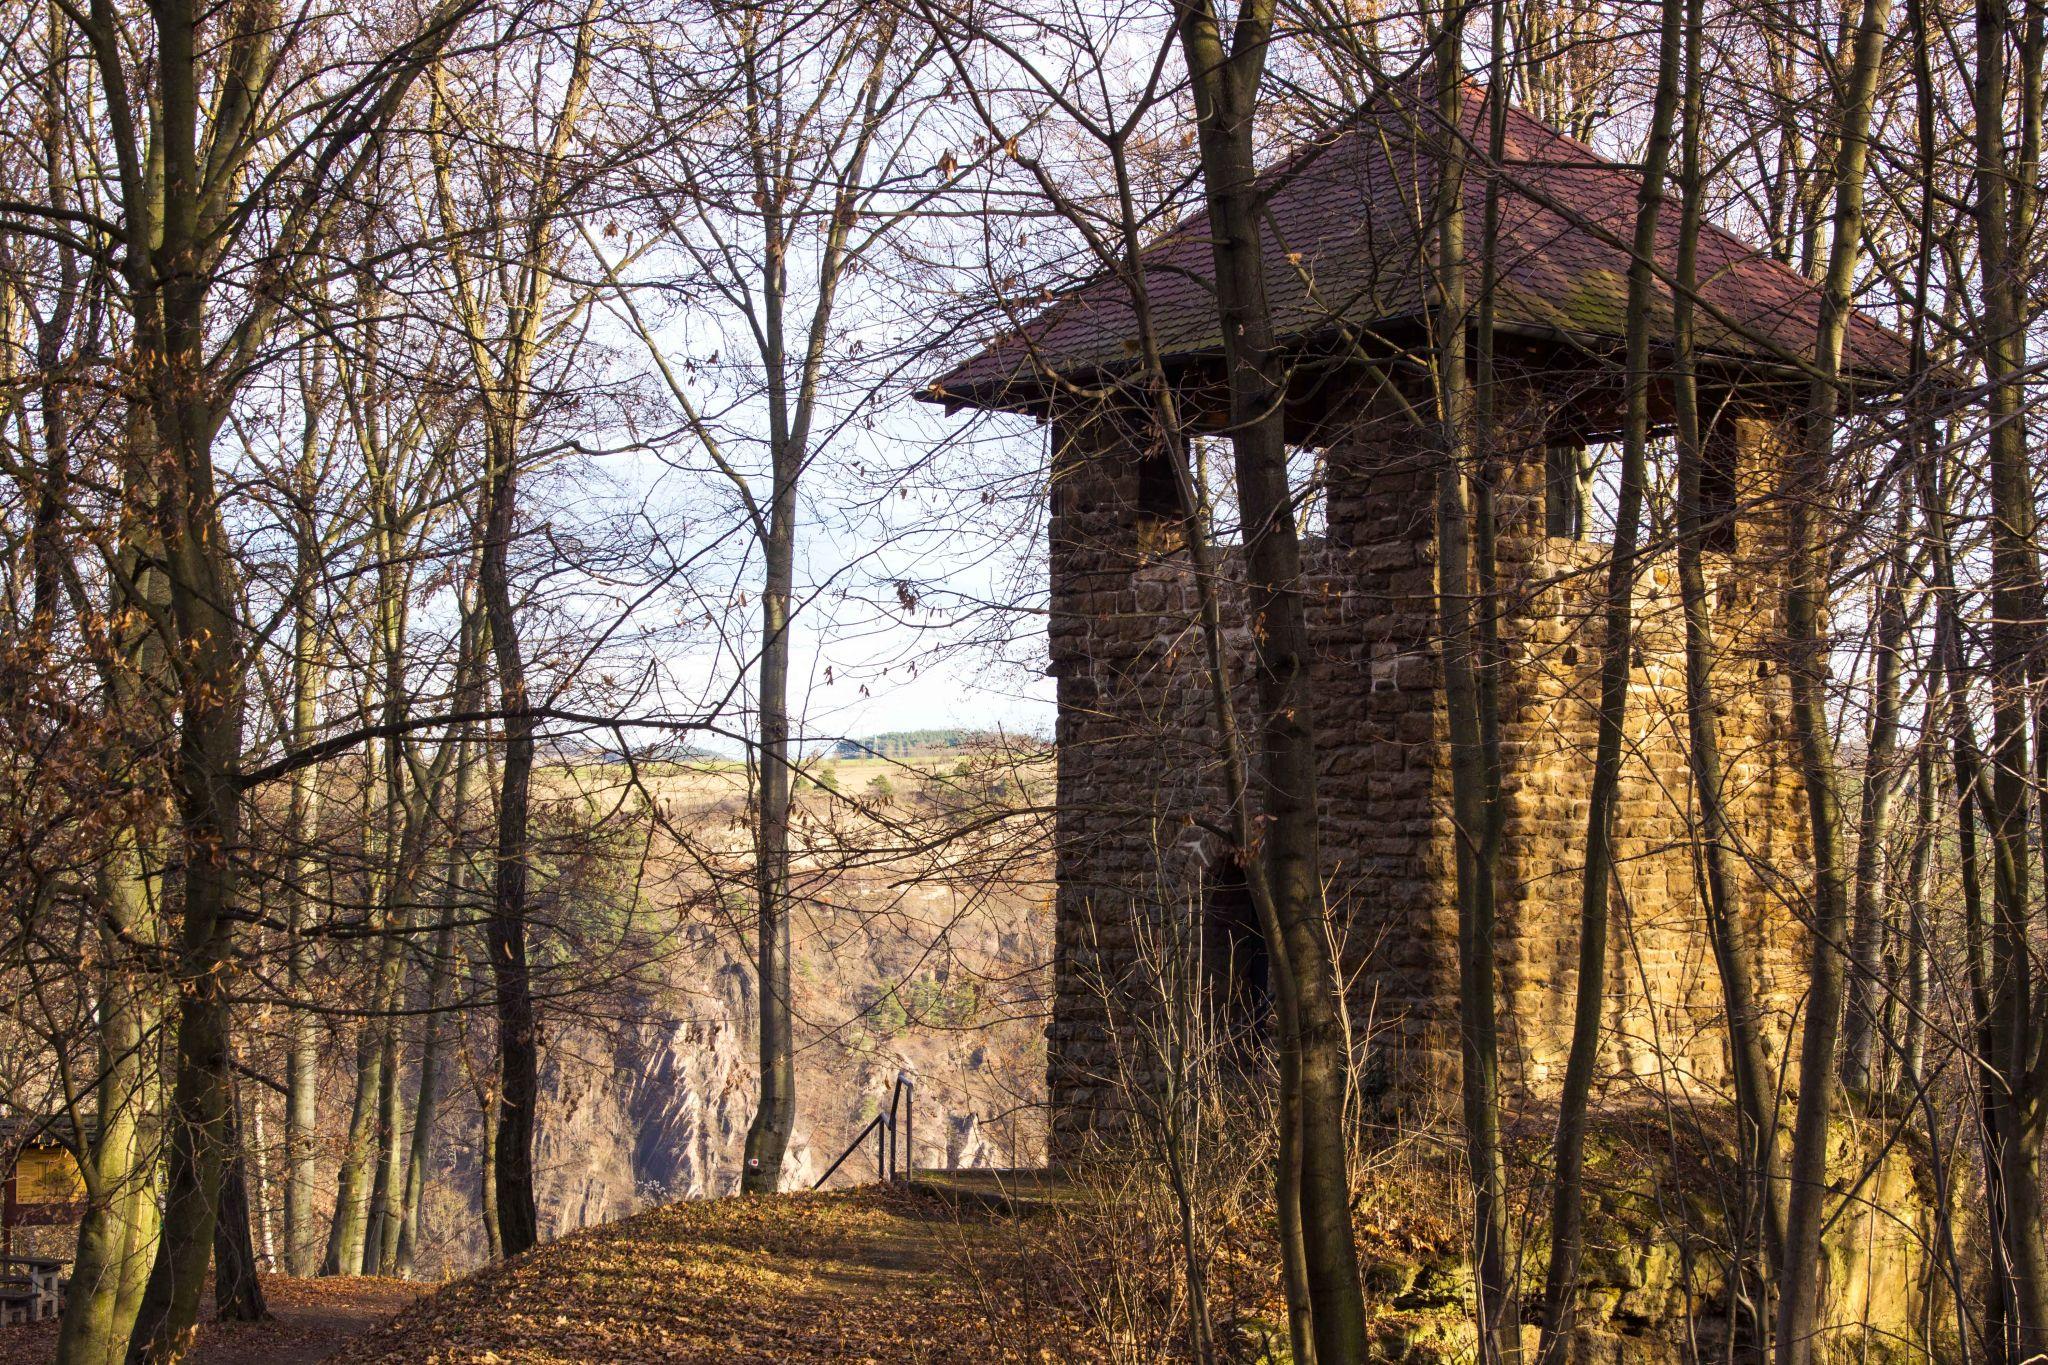 Fuchsturm, Germany